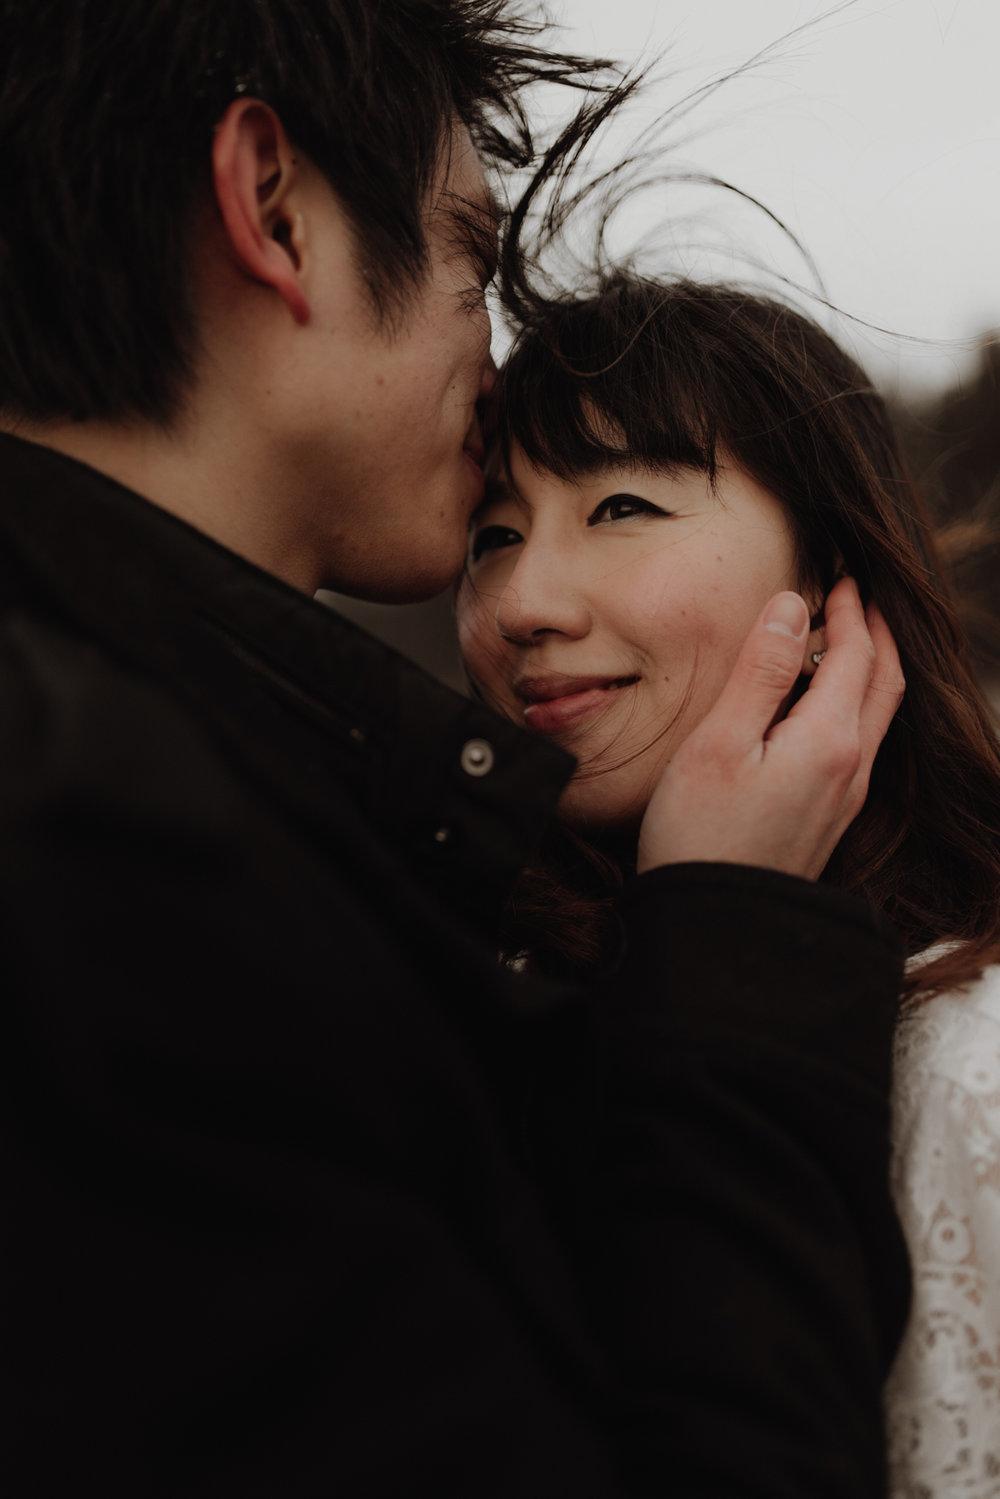 seattle-wedding-photographer-kerouac-0206.jpg